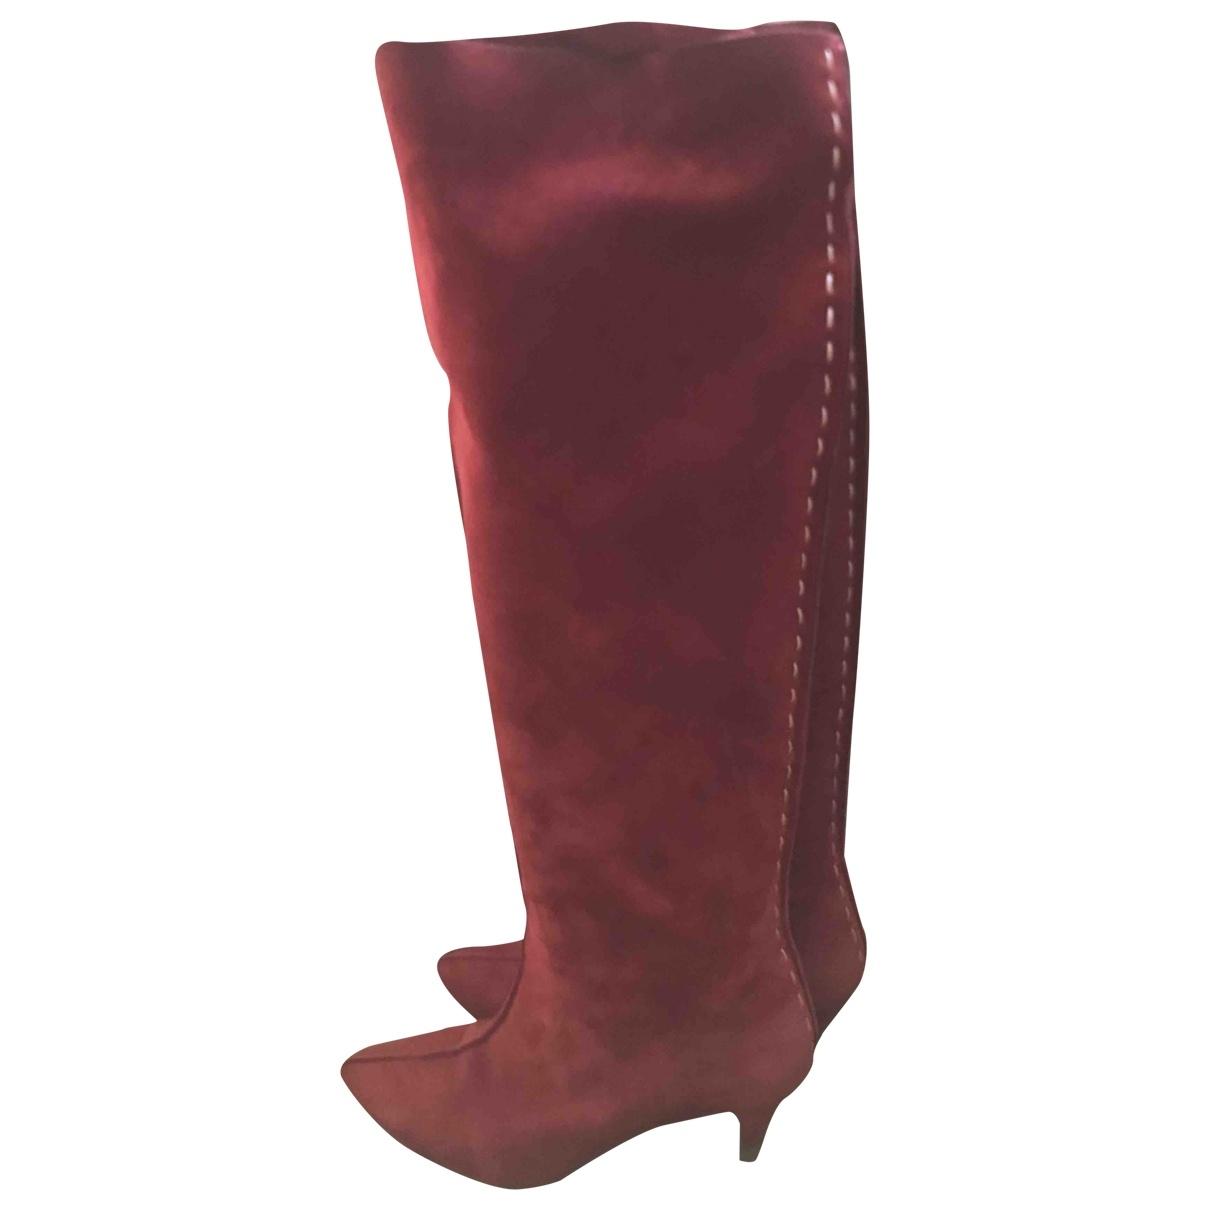 Amélie Pichard Boots